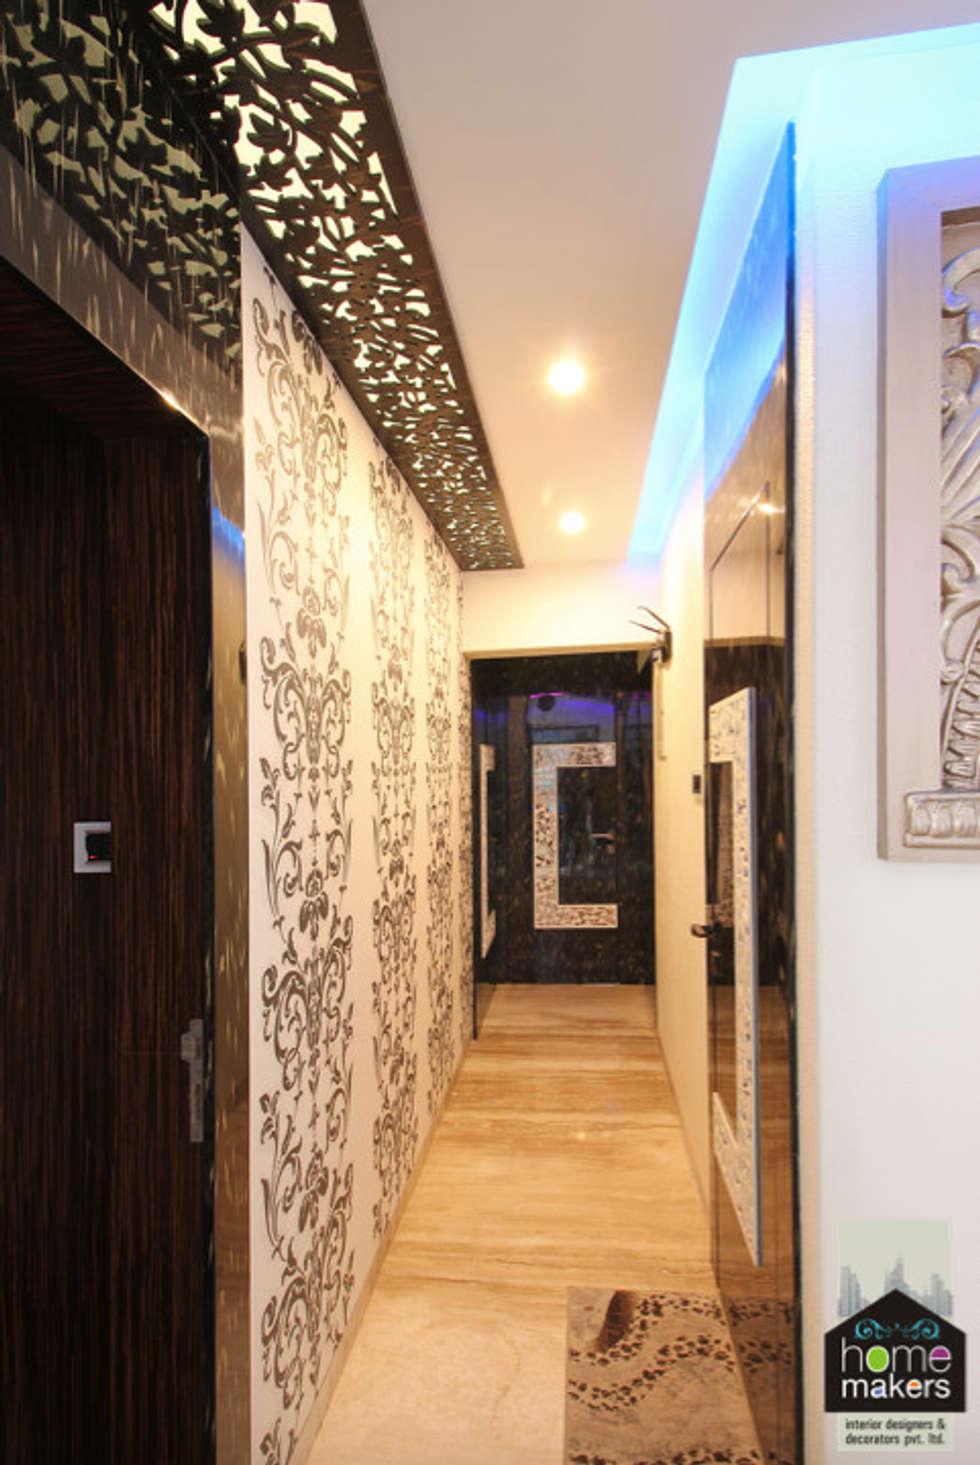 second passage corridor hallway by home makers interior designers